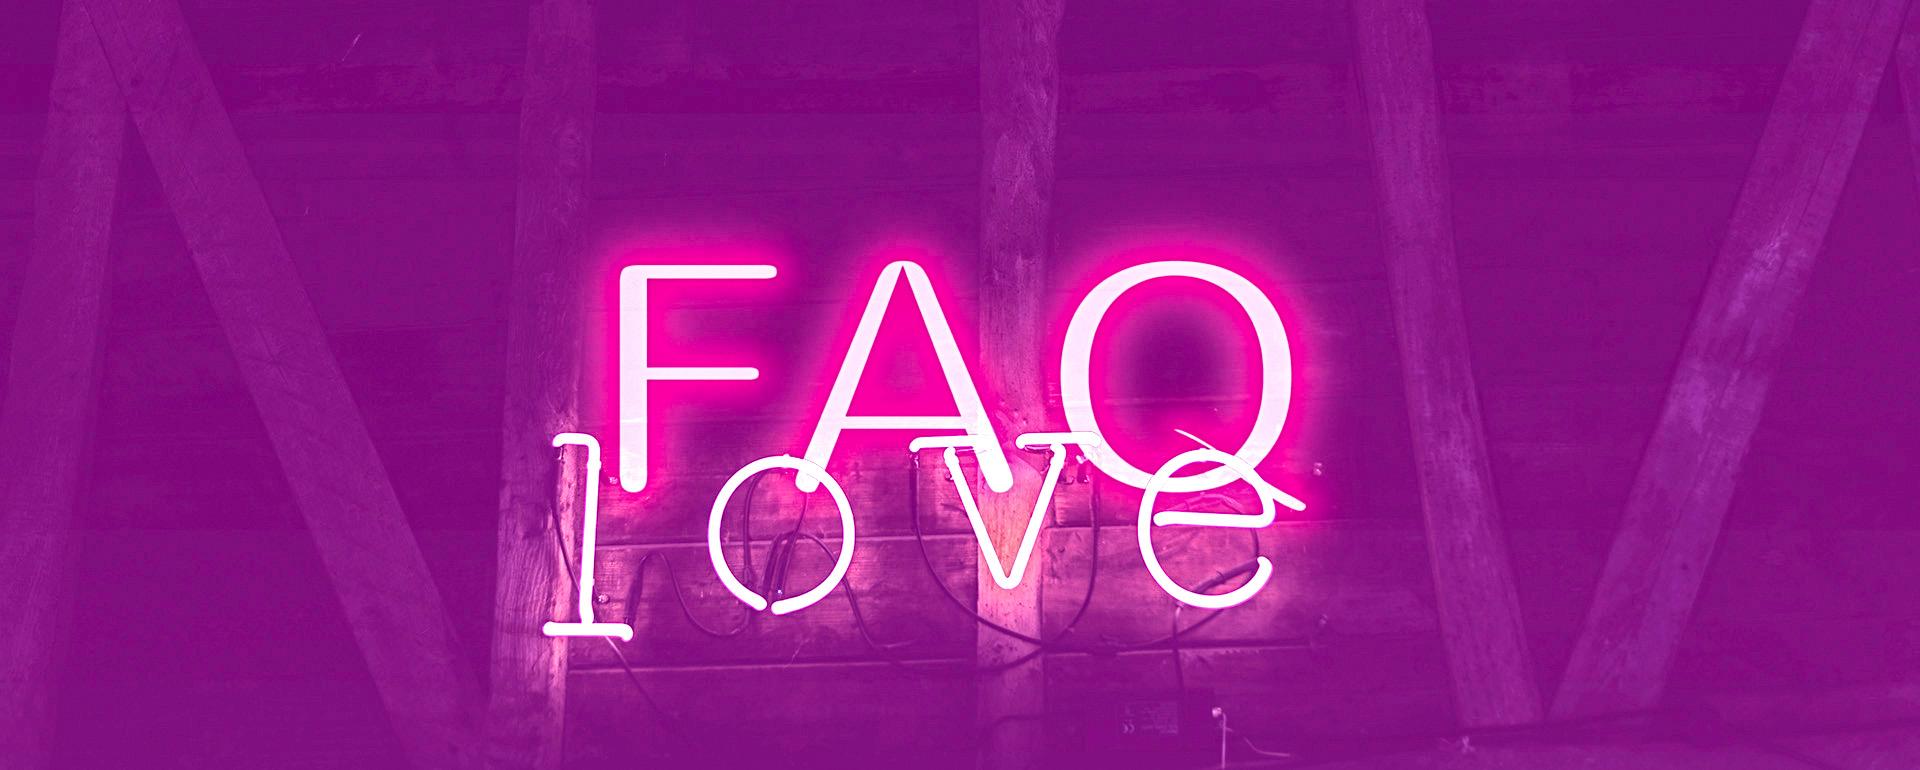 Preguntas frecuentes faq